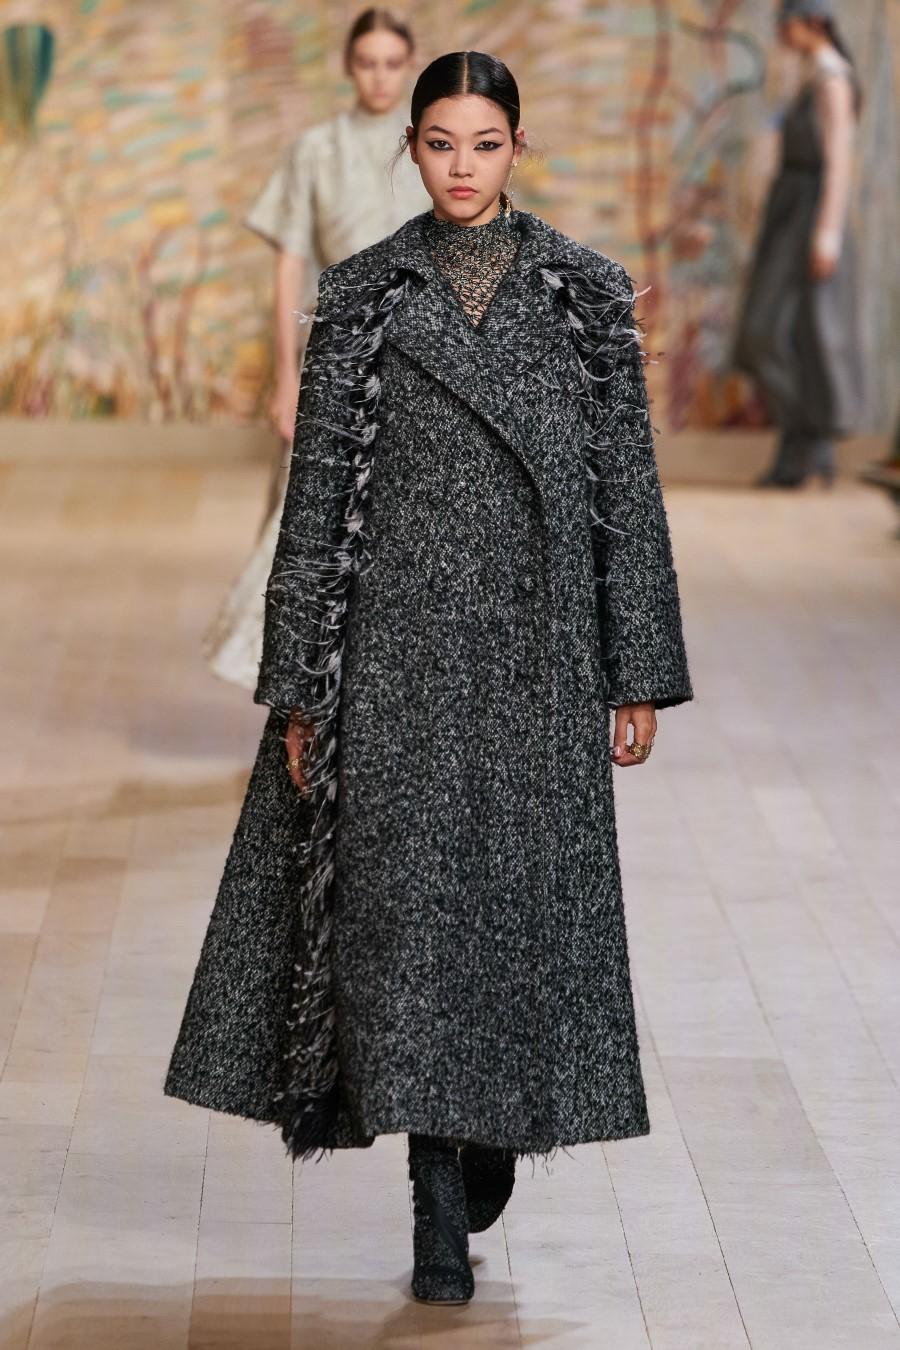 Christian Dior Haute Couture Fall Winter 2021